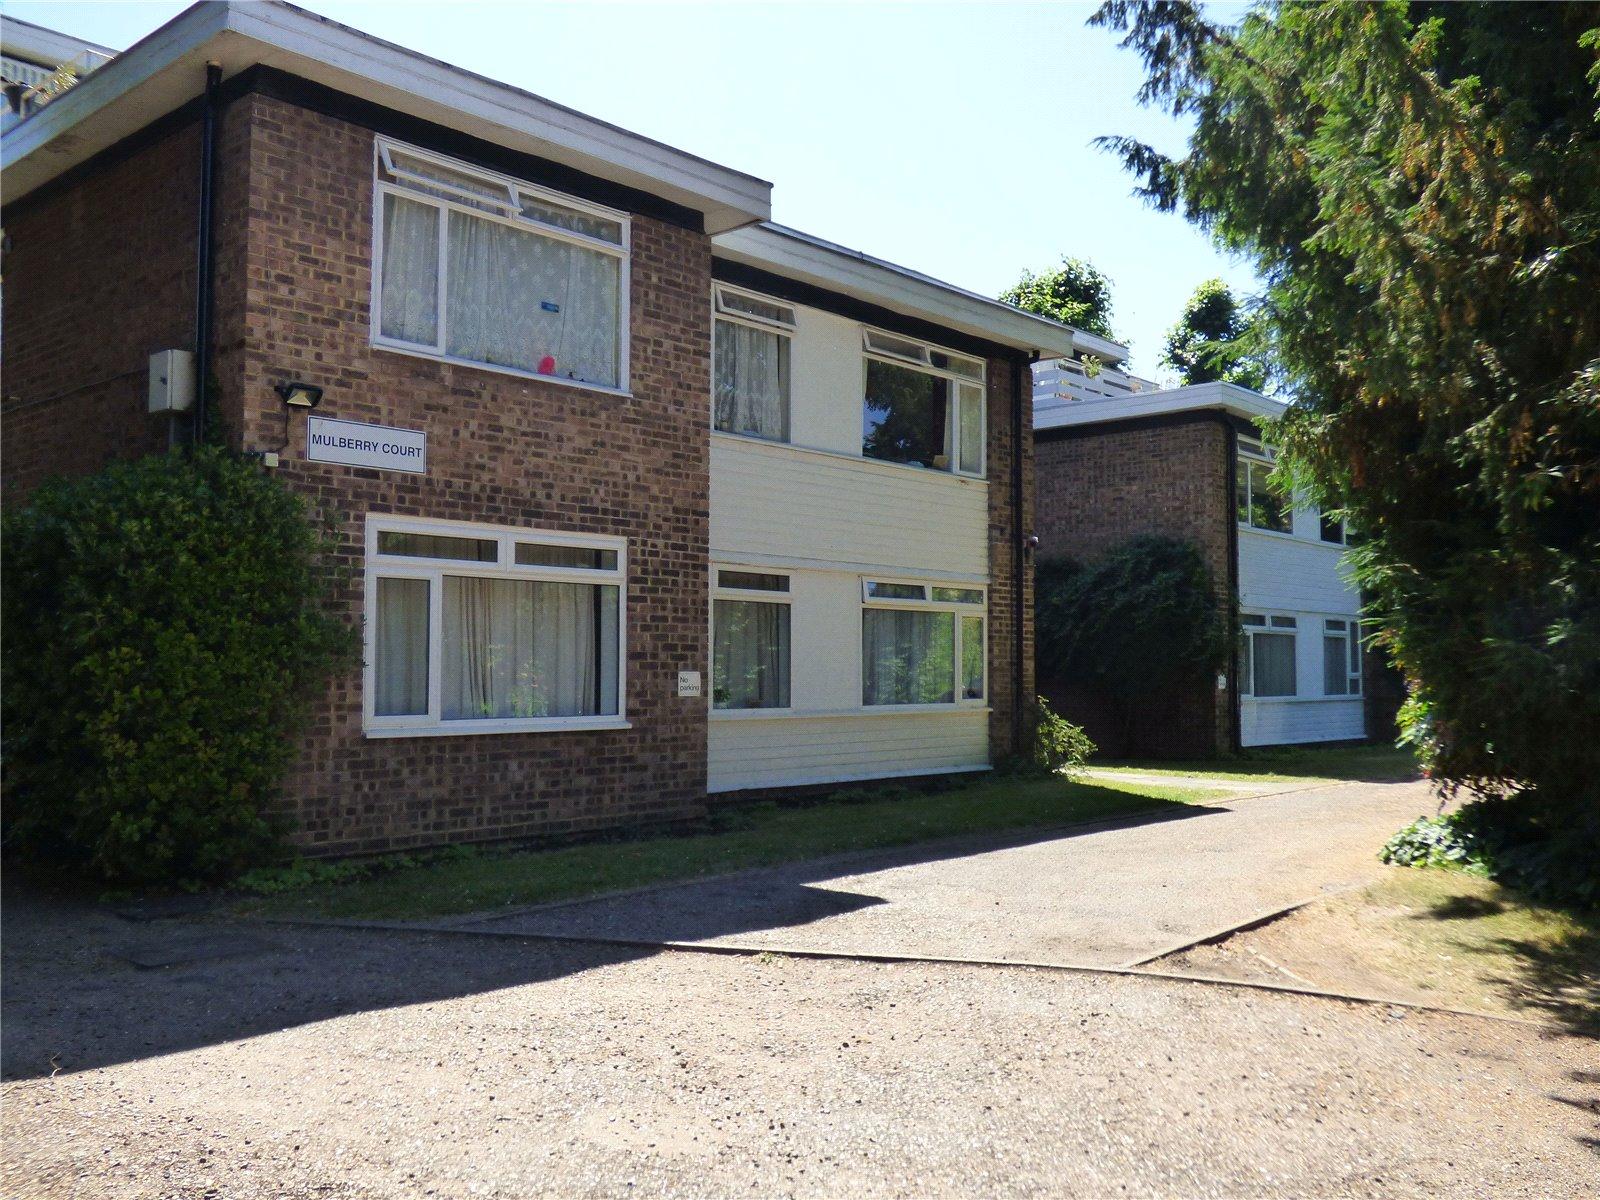 Strawberry Hill Road, Twickenham, TW1 4QA - Antony Roberts